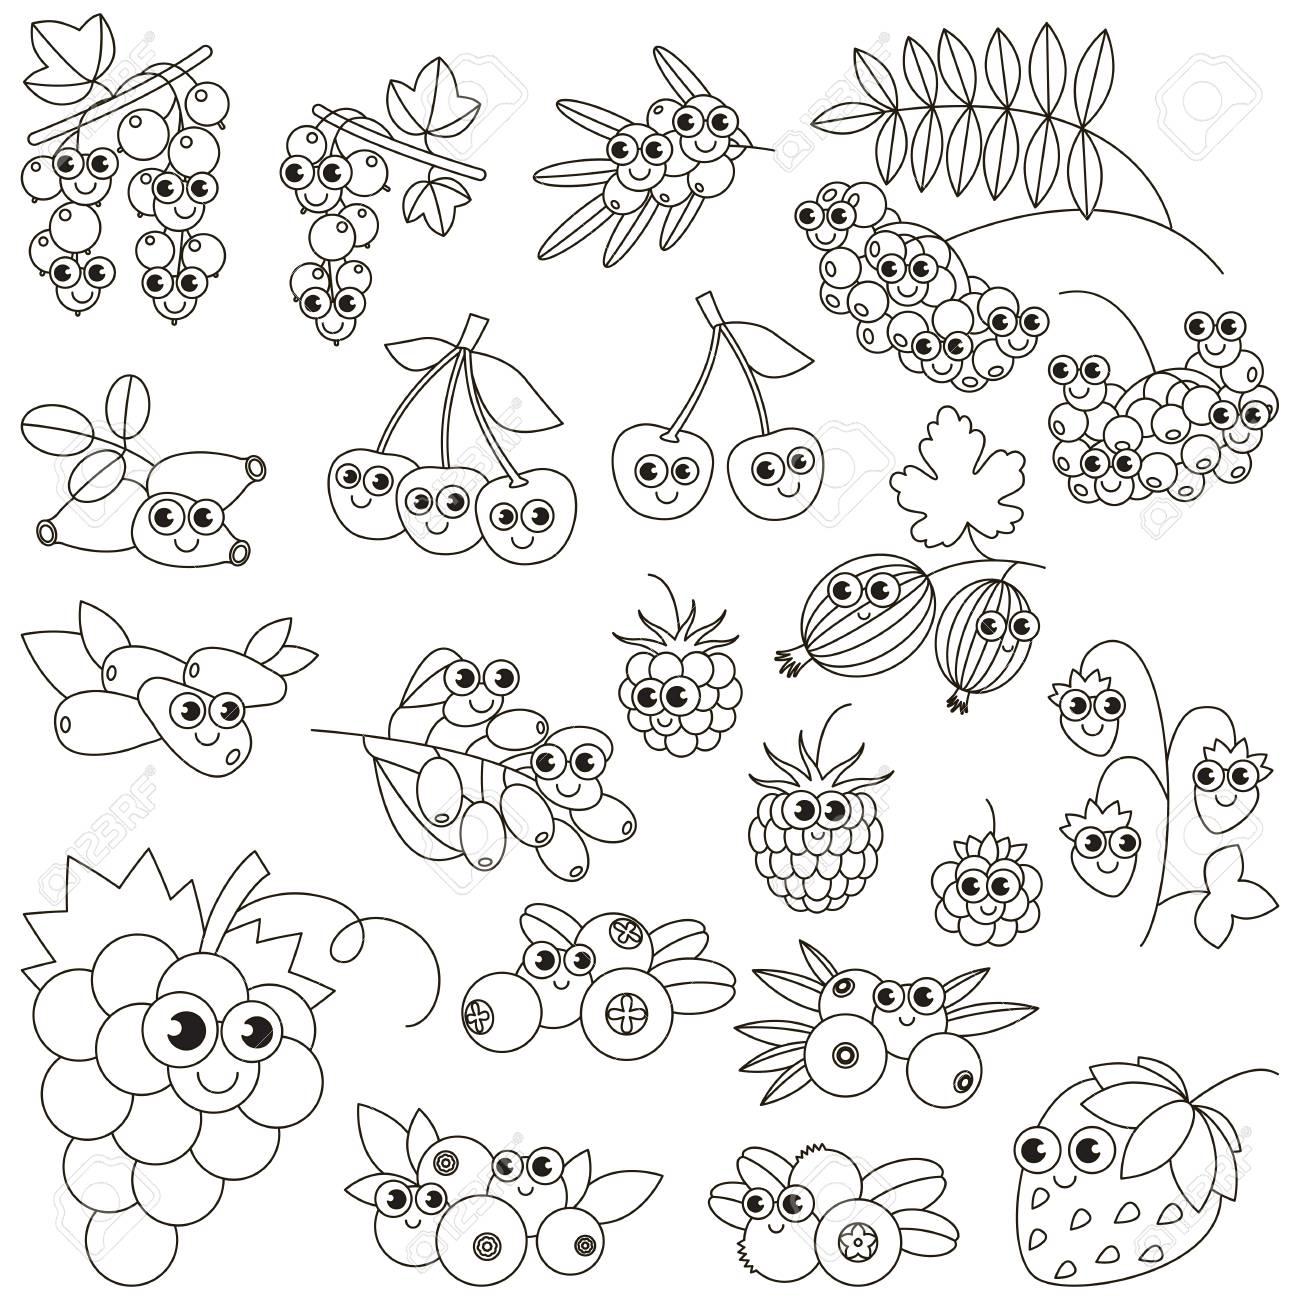 Conjunto De Divertidos Dibujos Animados Bayas Para Colorear  Libro